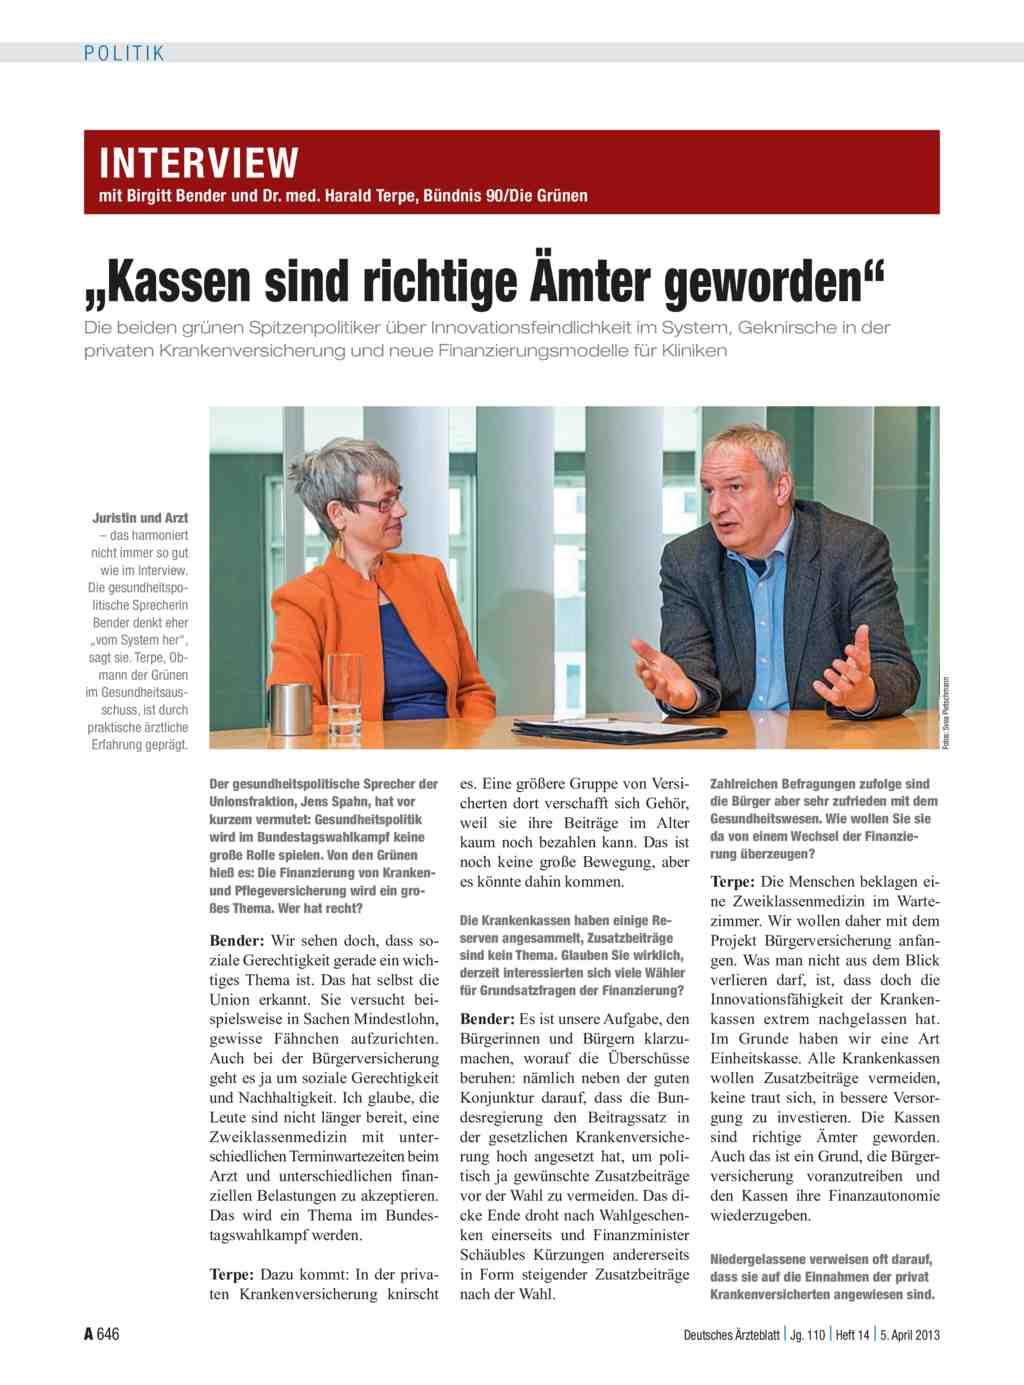 Interview mit Birgitt Bender und Dr. med. Harald Terpe, Bündnis 90 ...